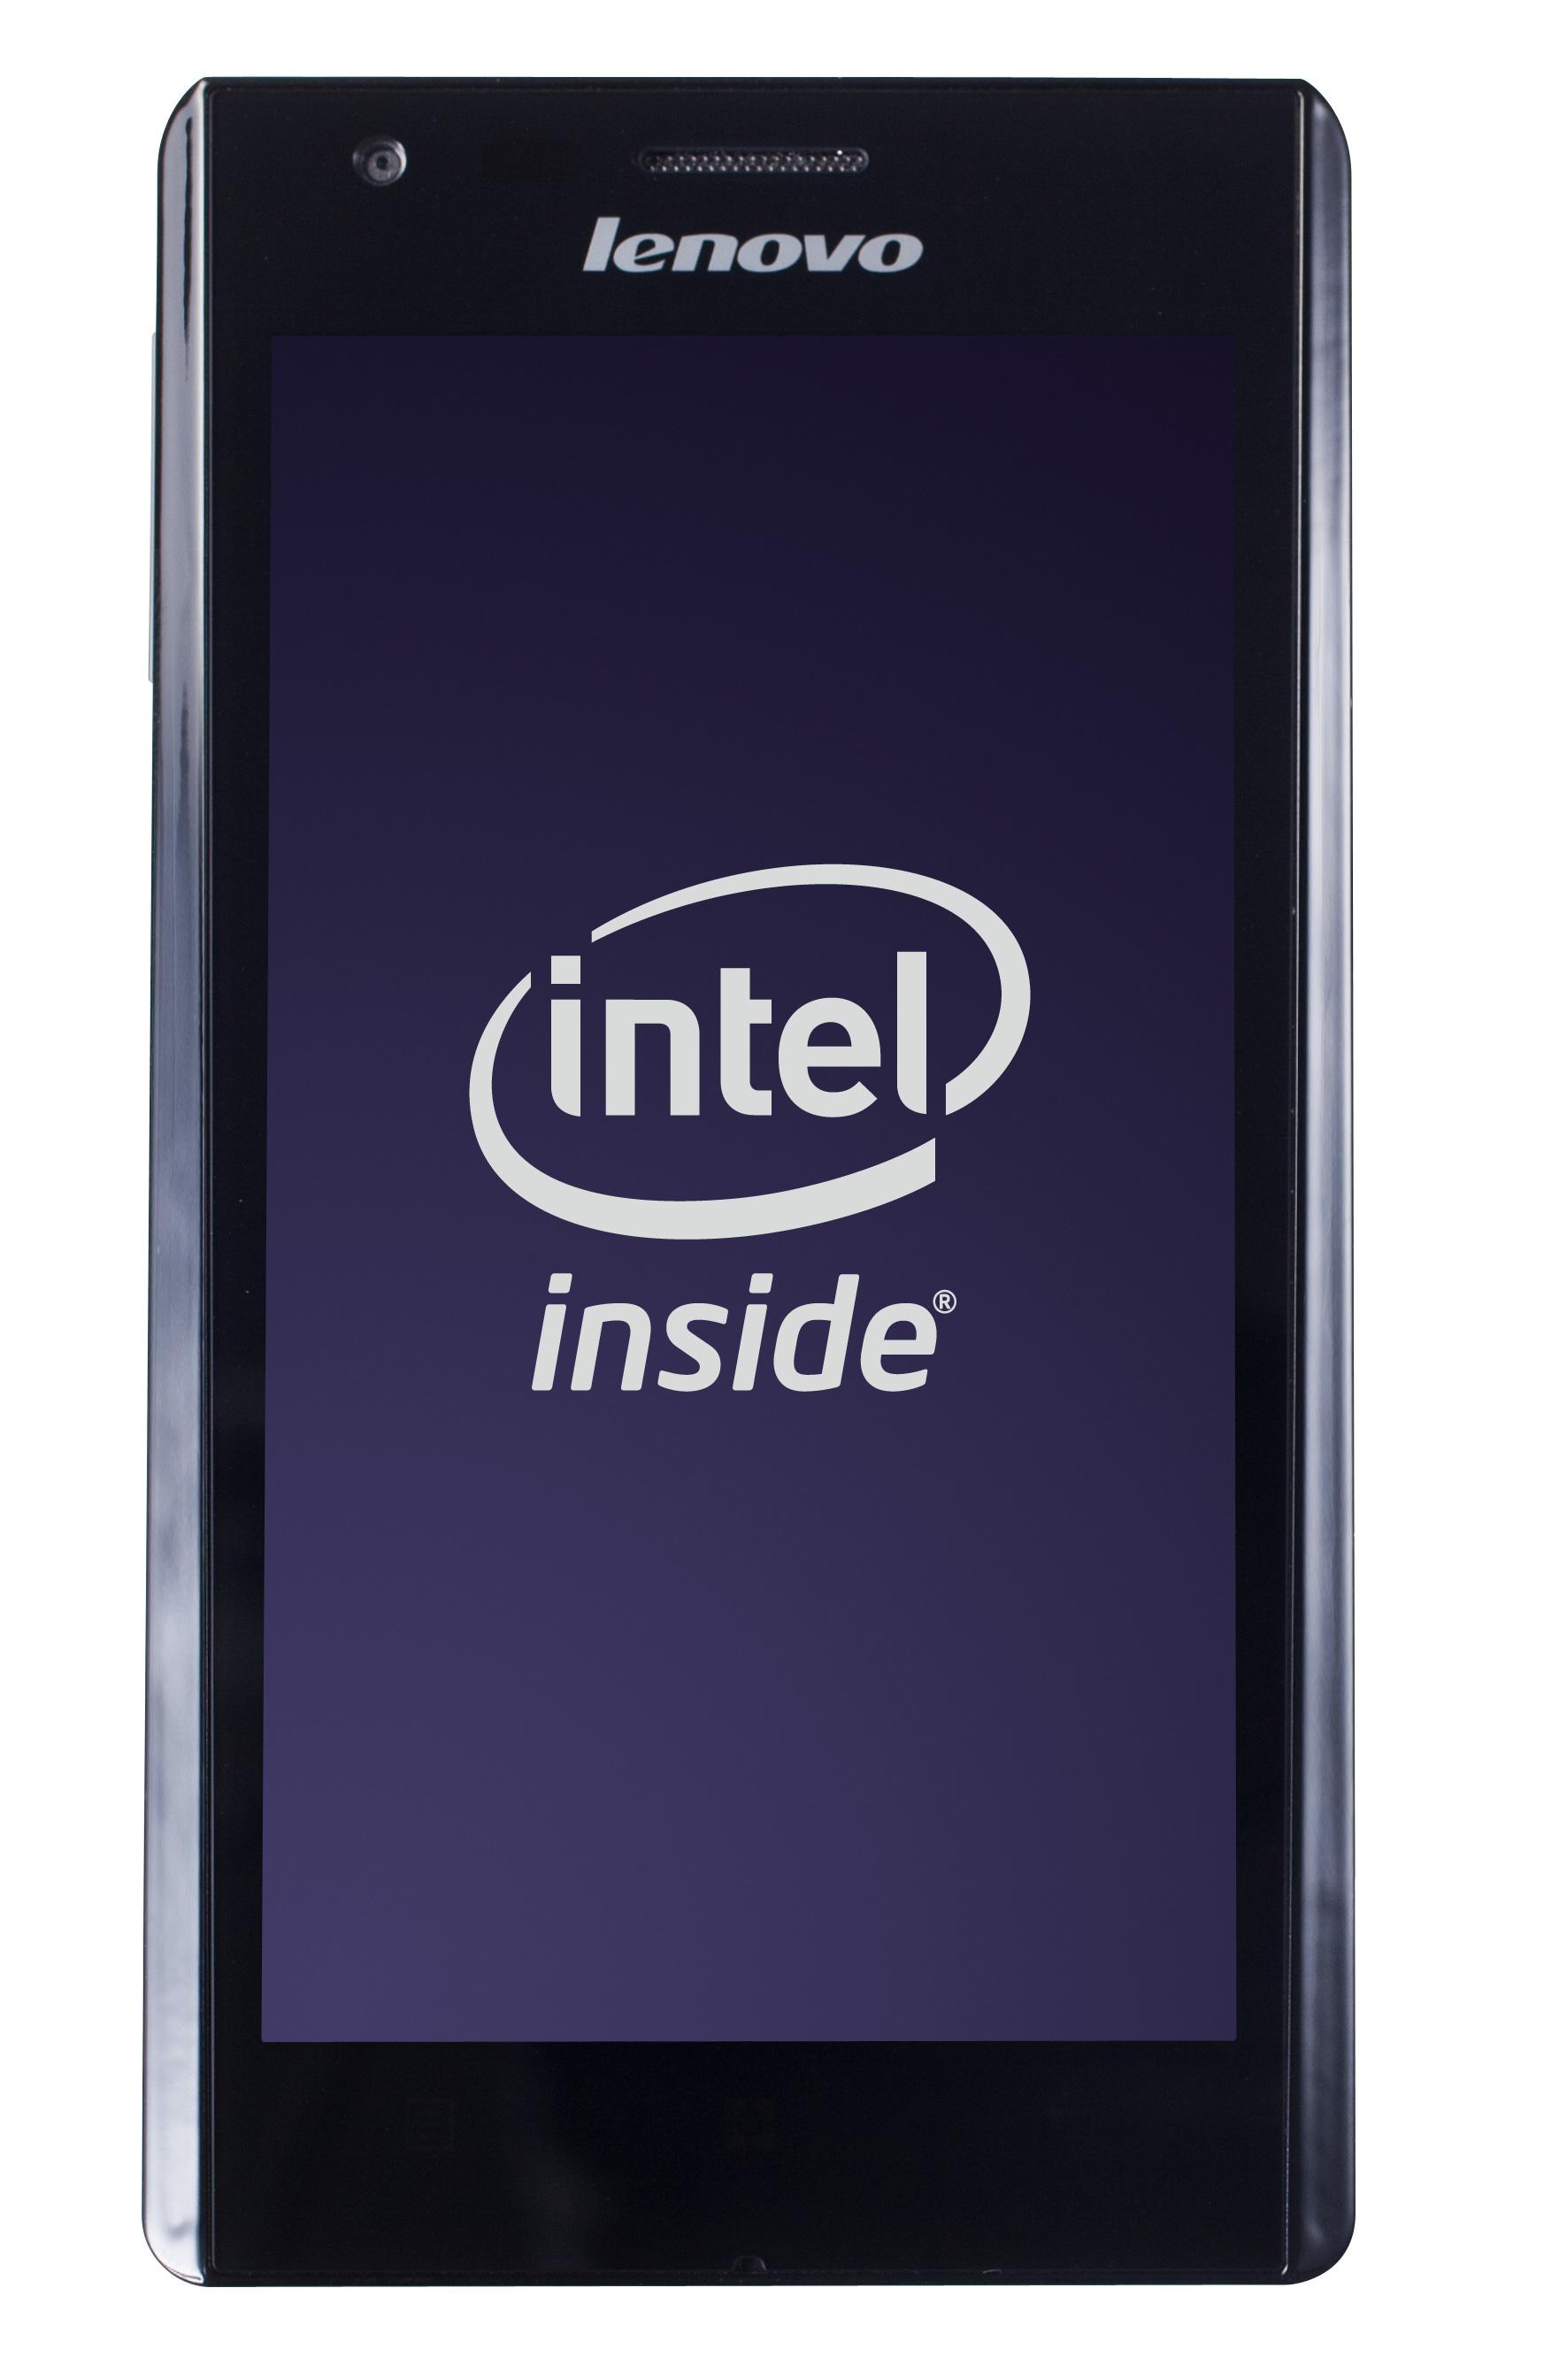 inside intel inside Find great deals on ebay for intel inside shop with confidence.